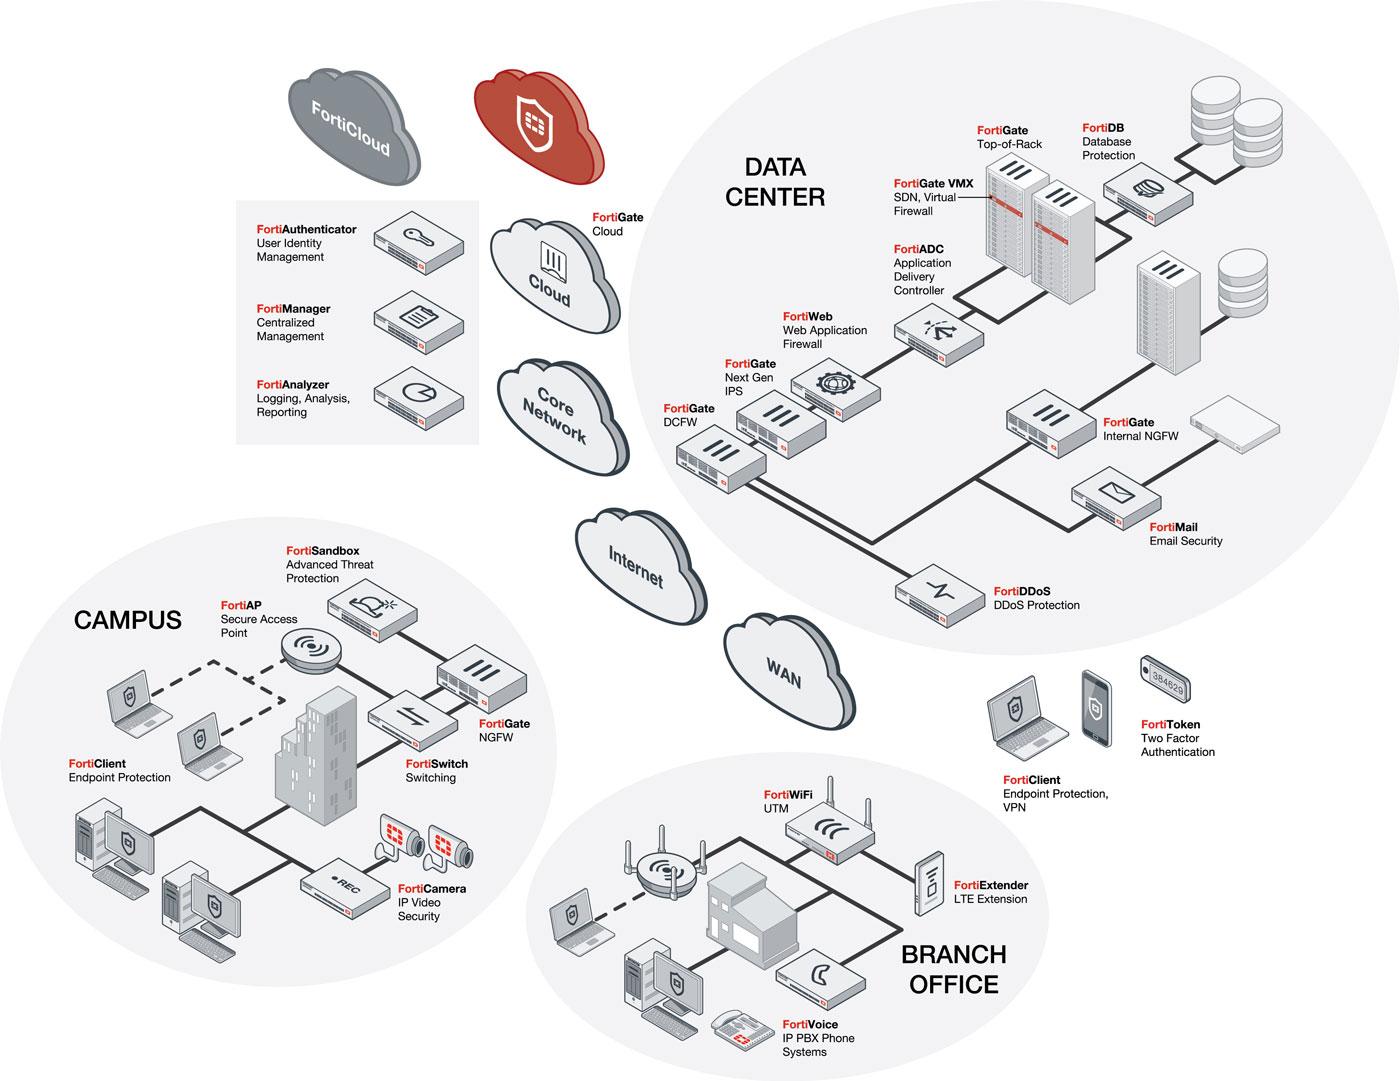 Fortinet Laurentian Technologies